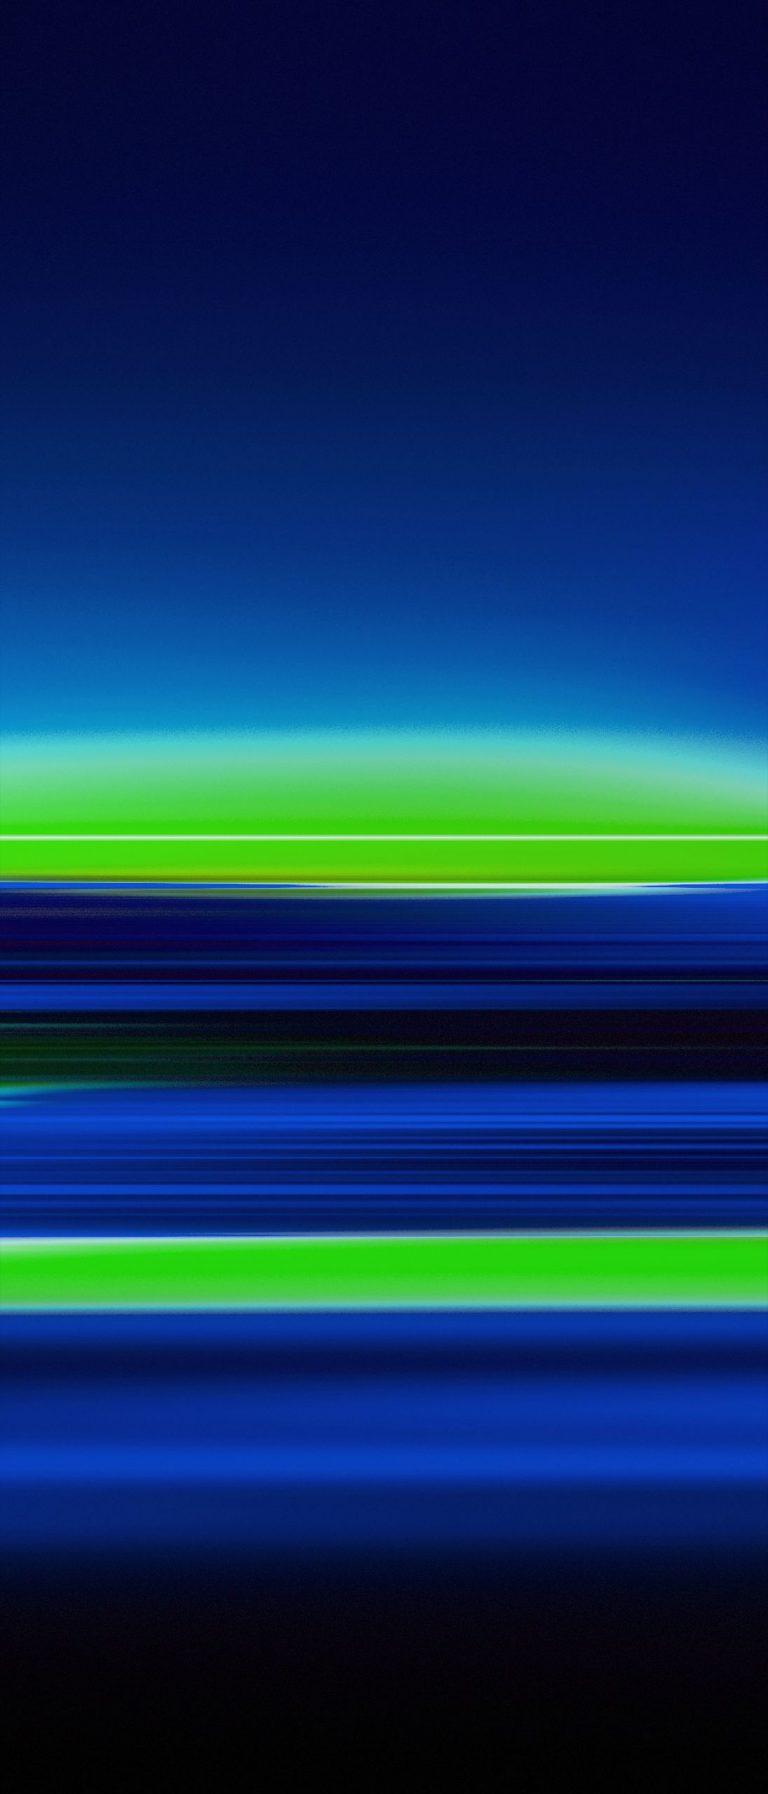 Sony Xperia 5 Stock Wallpaper 02 1096x2560 768x1794